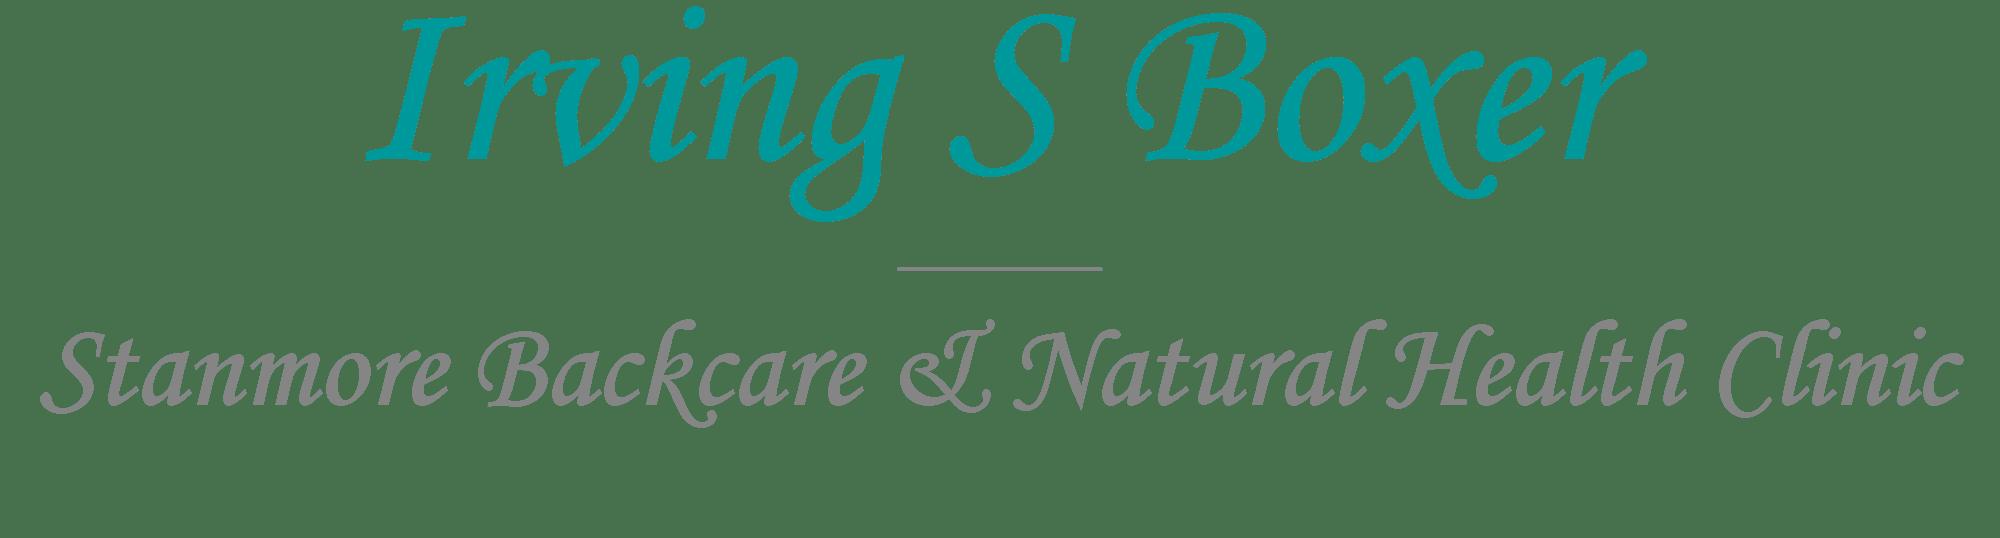 Irving S Boxer Logo.